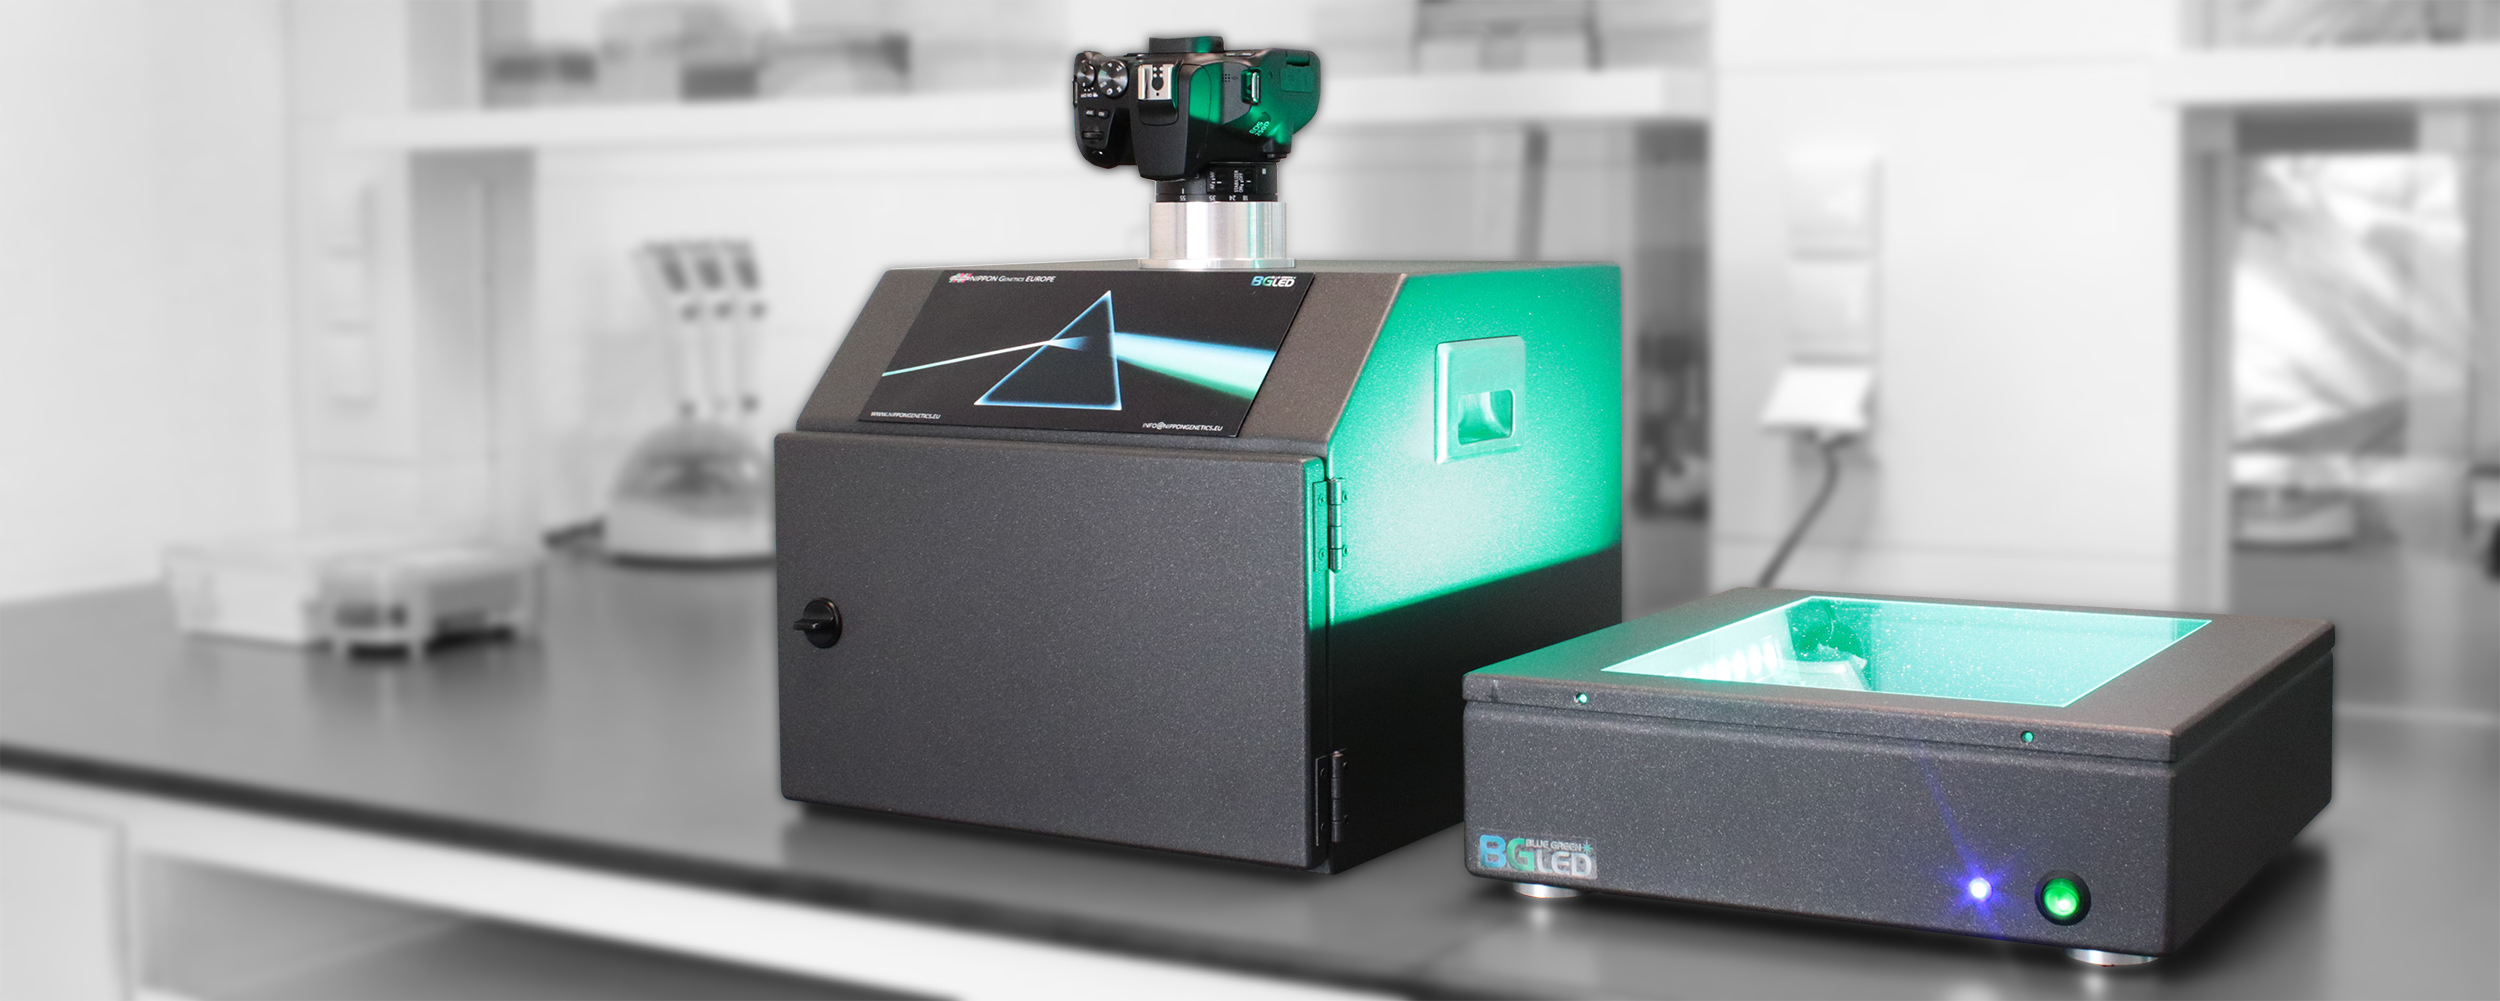 FastGene FAS-DIGI-Compact dark box and transilluminator